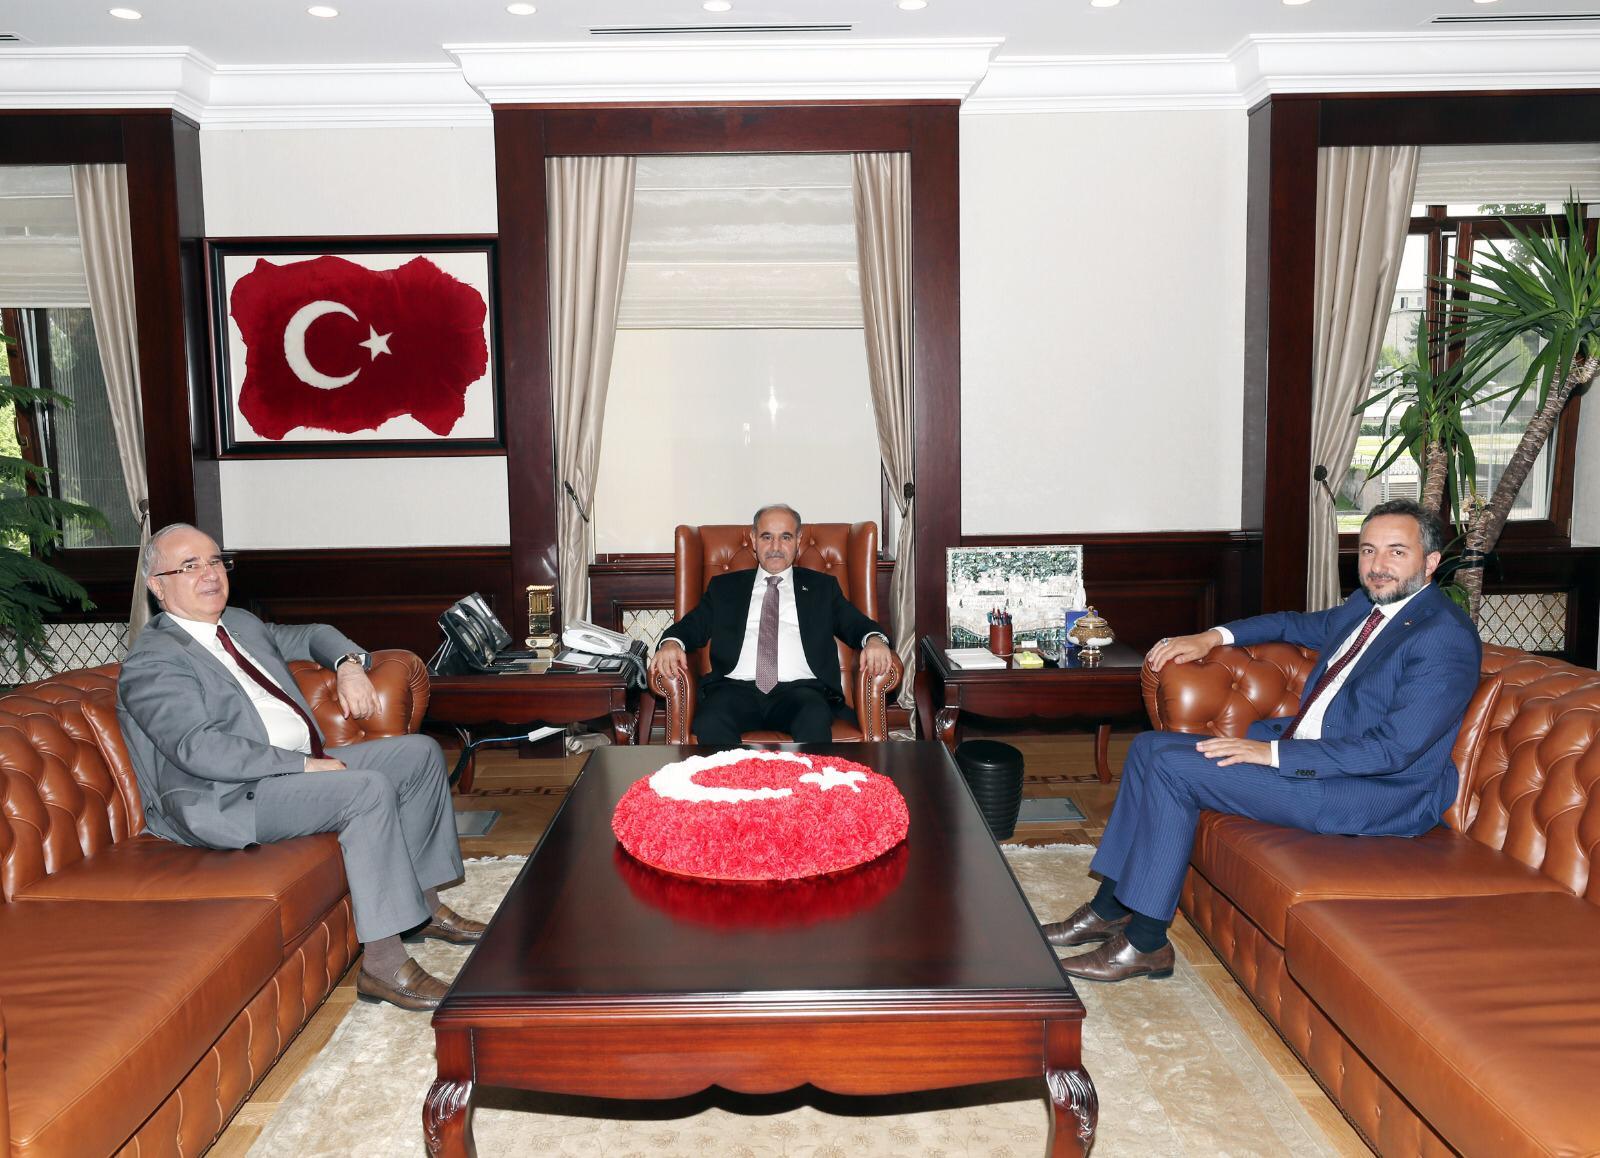 TSO BAŞKANI ARSLAN, EMNİYET GENEL MÜDÜRÜ AKTAŞ'I ZİYARET ETTİ.